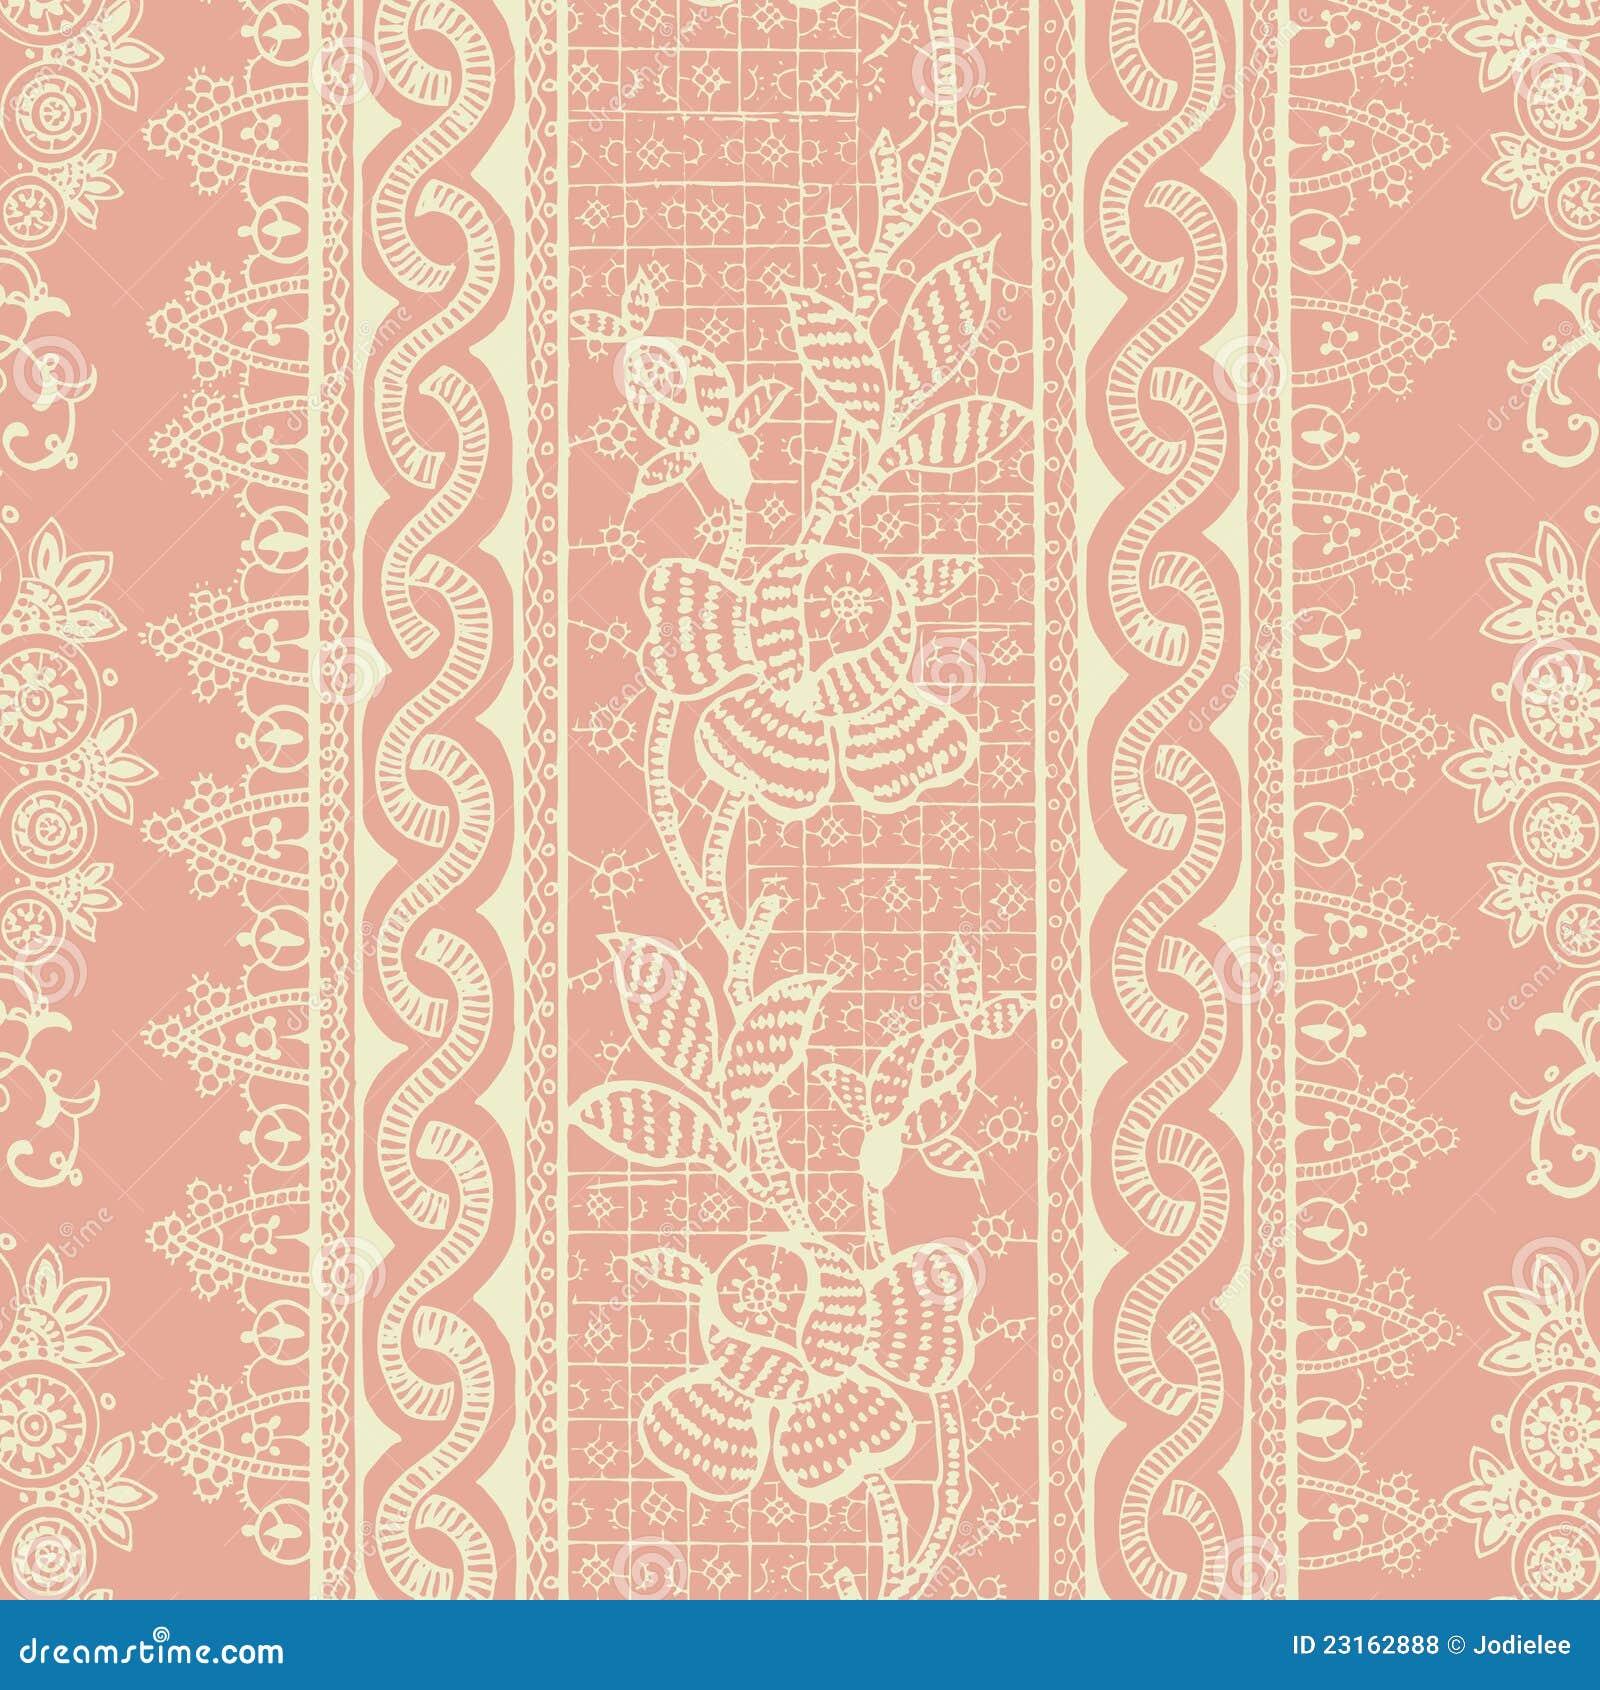 Bohemian Backgrounds: Antique Vintage Floral Bohemian Background Royalty Free